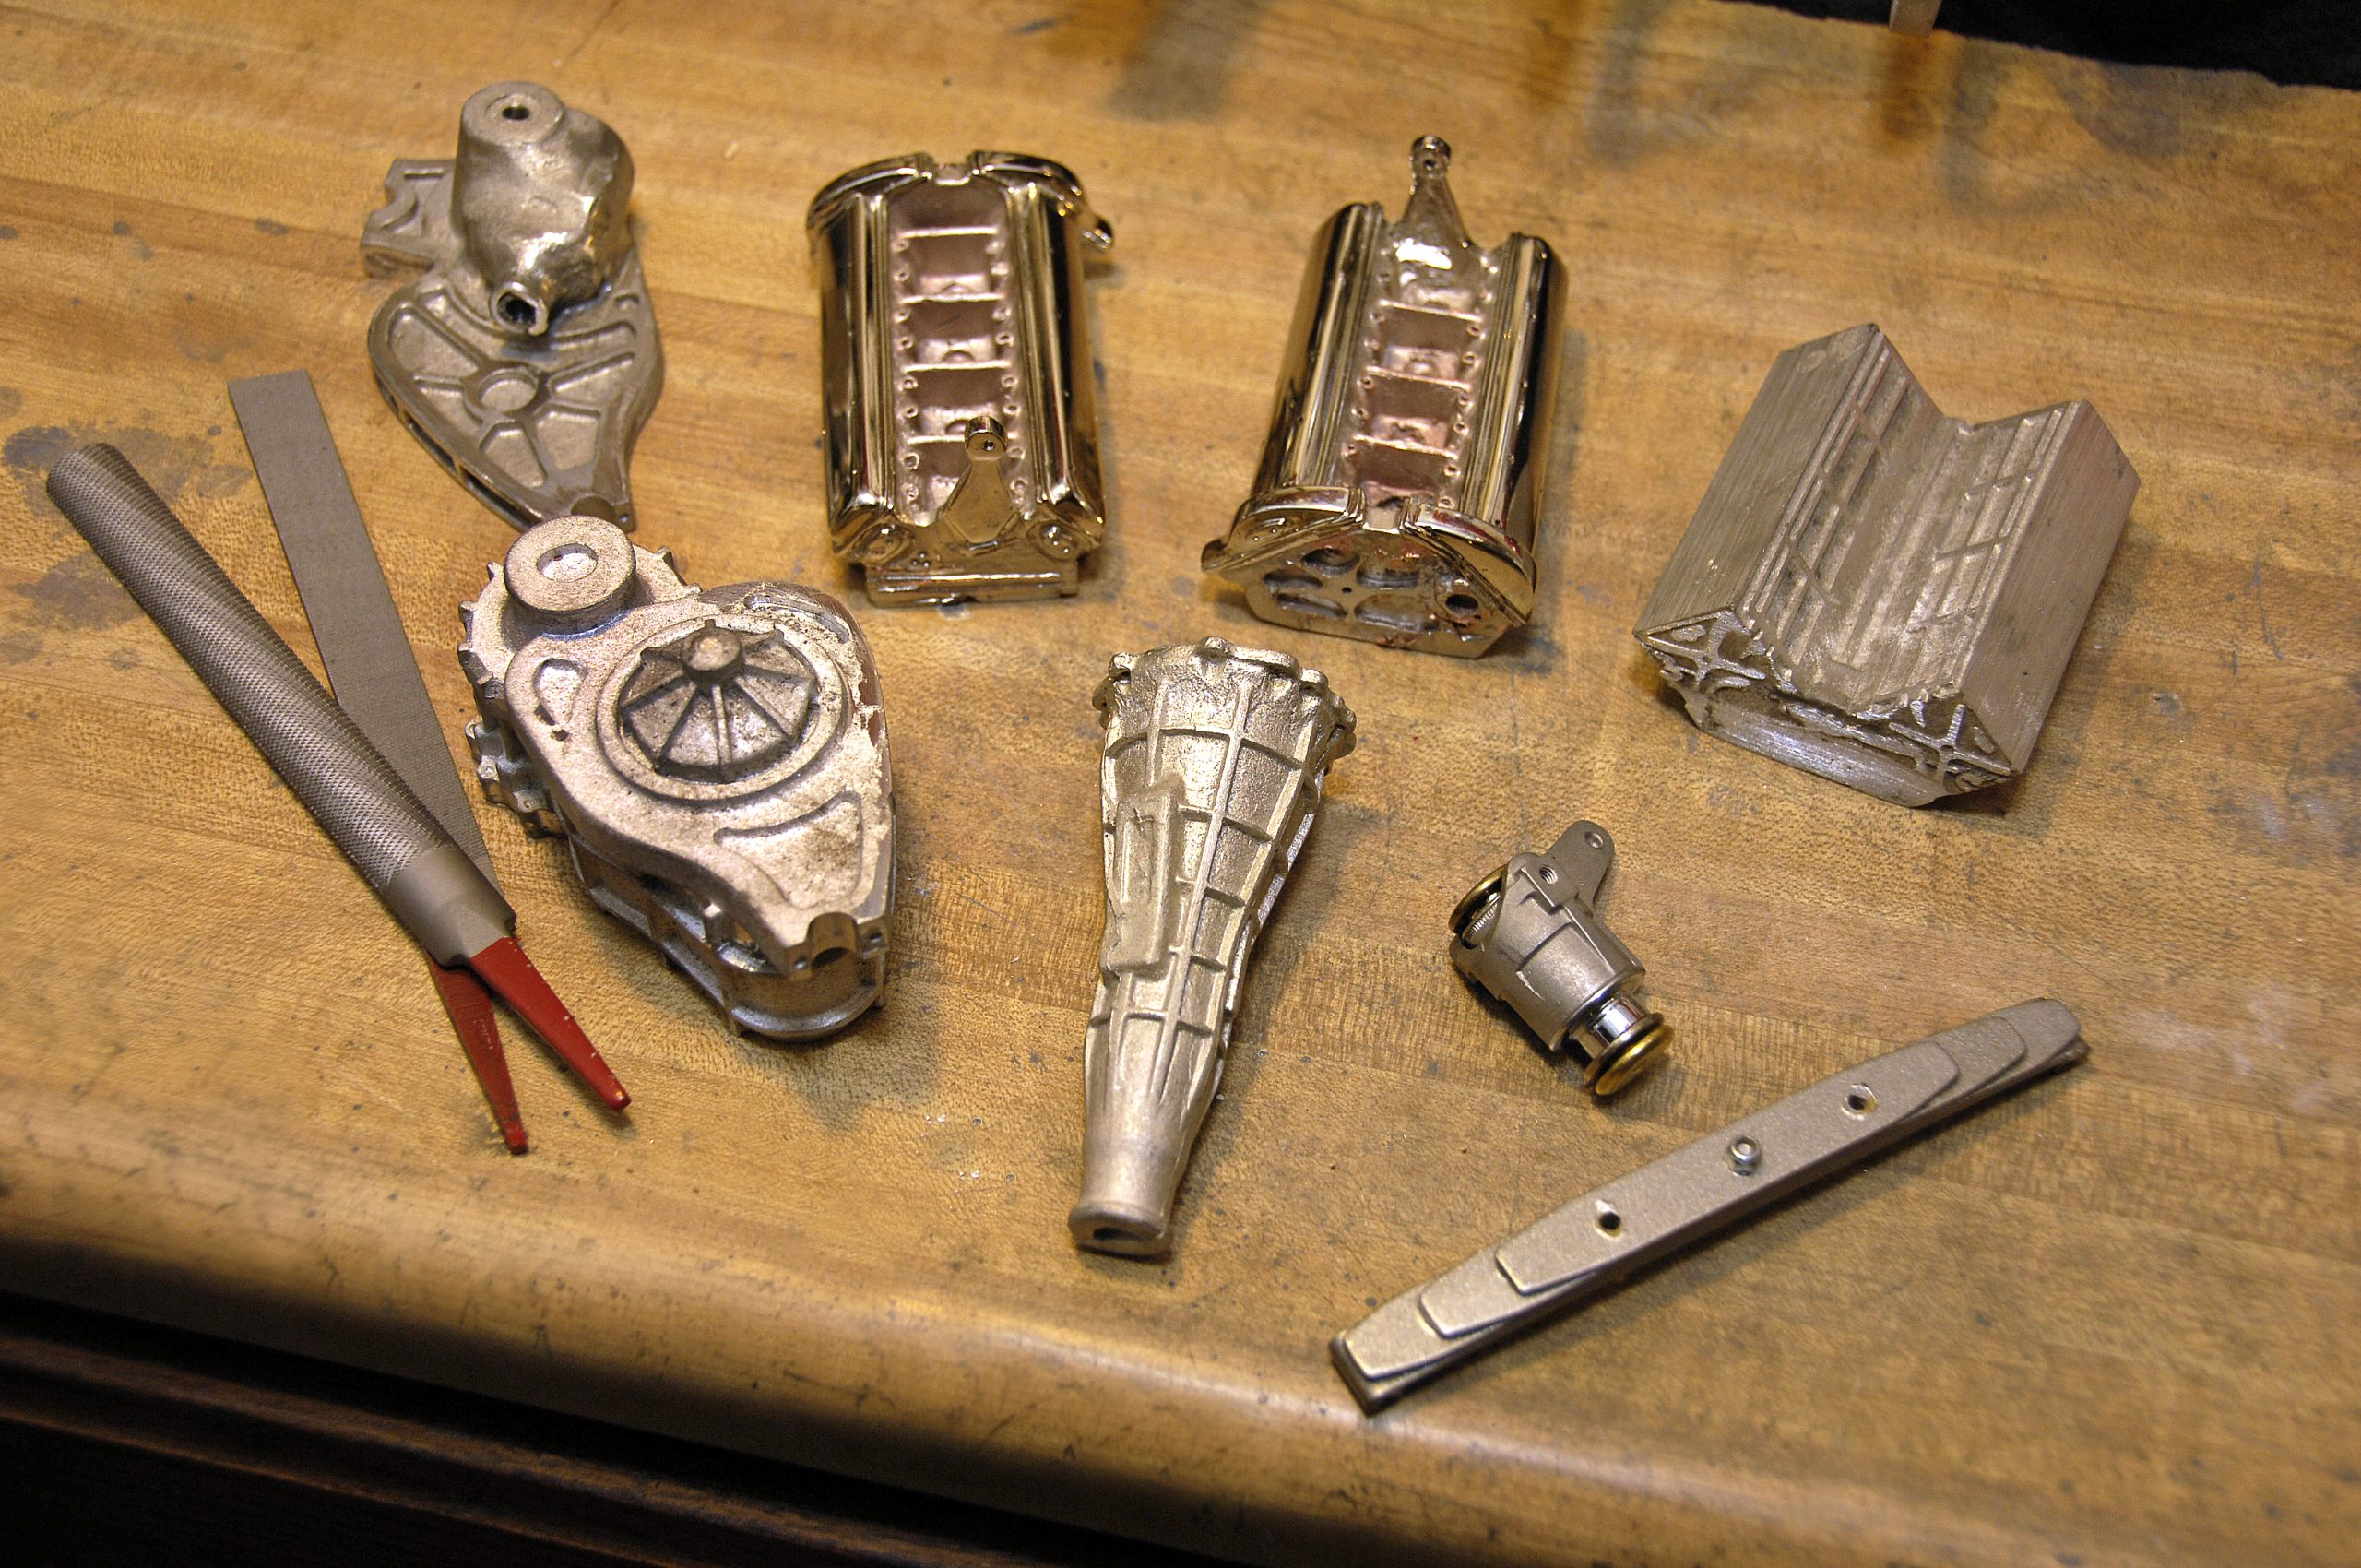 ferrari scale model parts on table detail